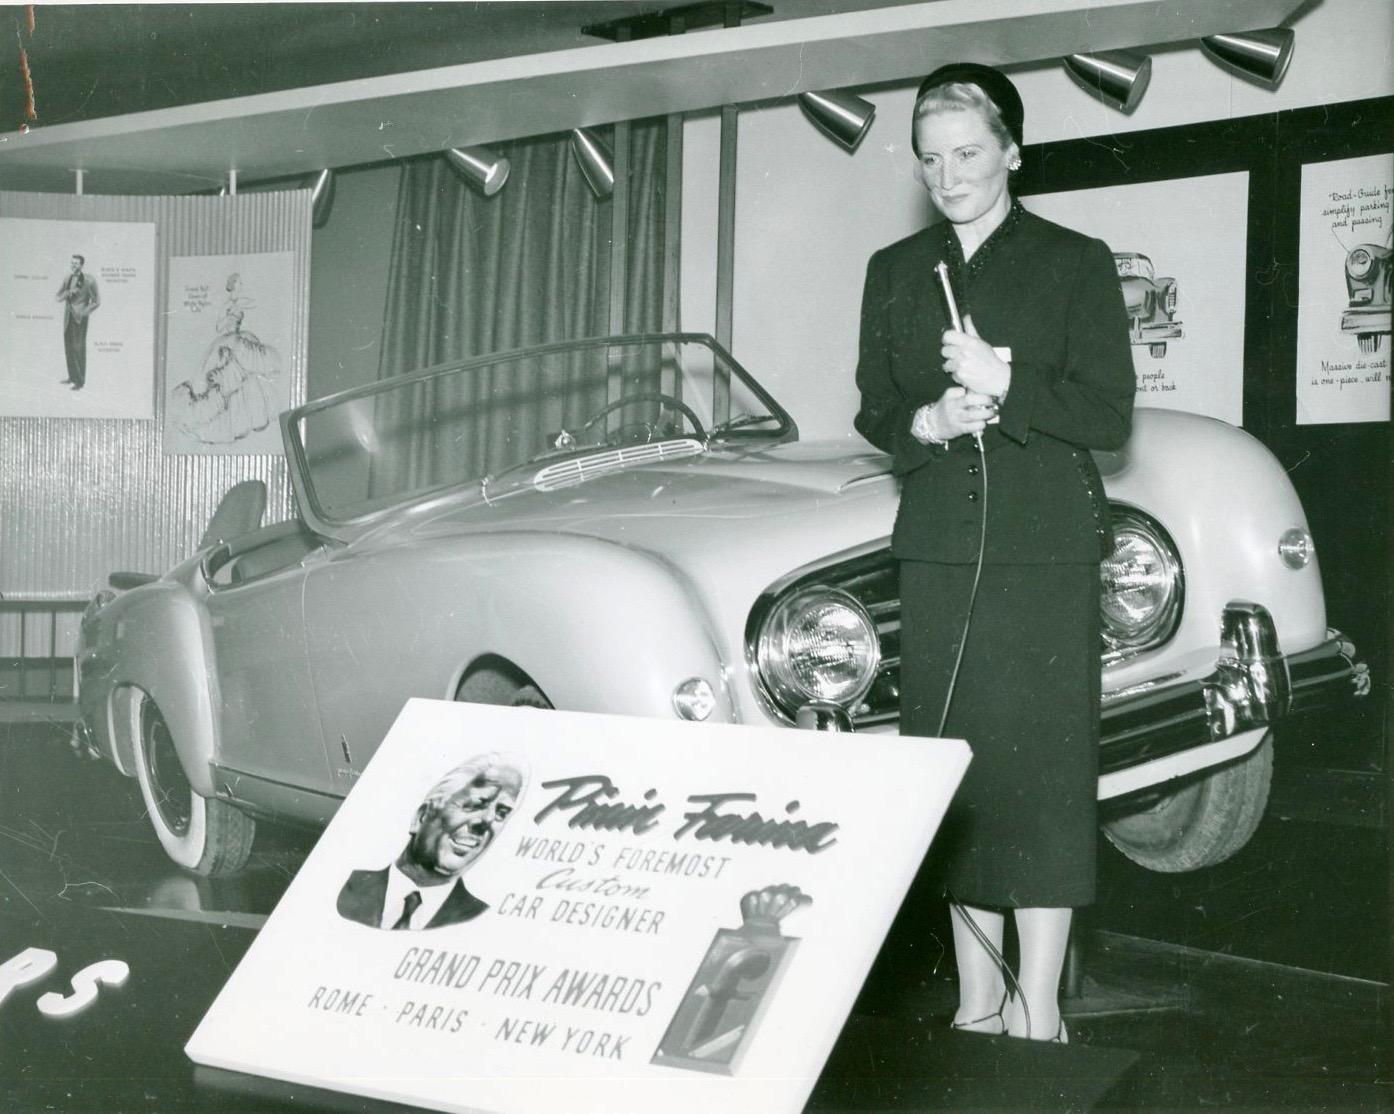 Helene Award, Her generosity will be rewarded with the first Helene Award, ClassicCars.com Journal